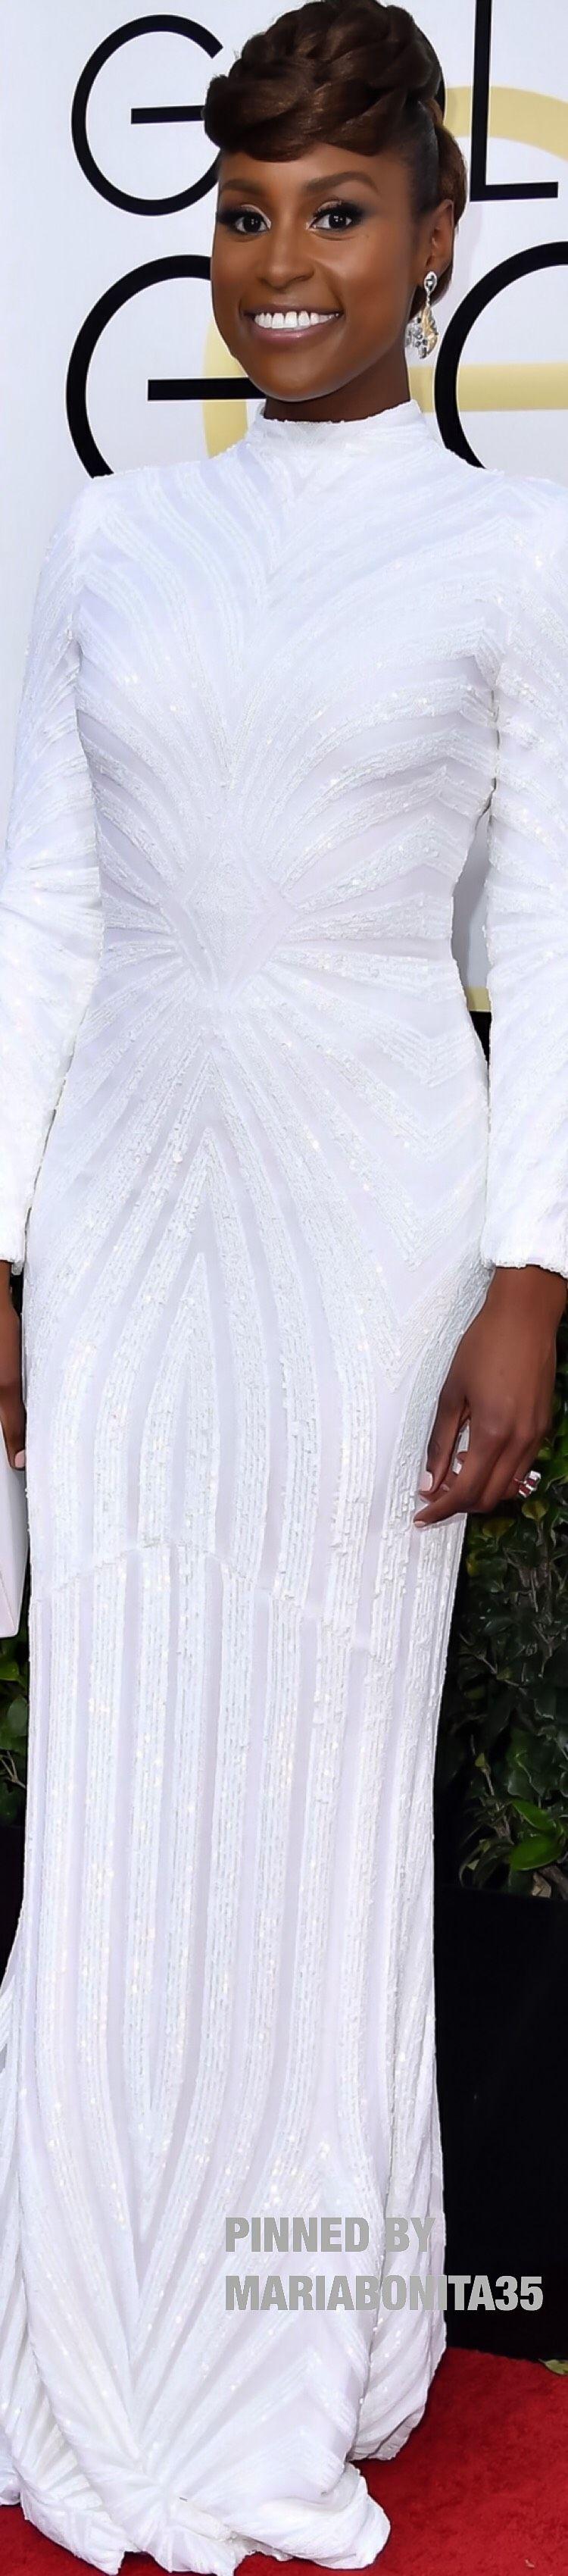 2017 Golden Globe Awards Red Carpet Arrivals Issa Rae wearing Christian Siriano